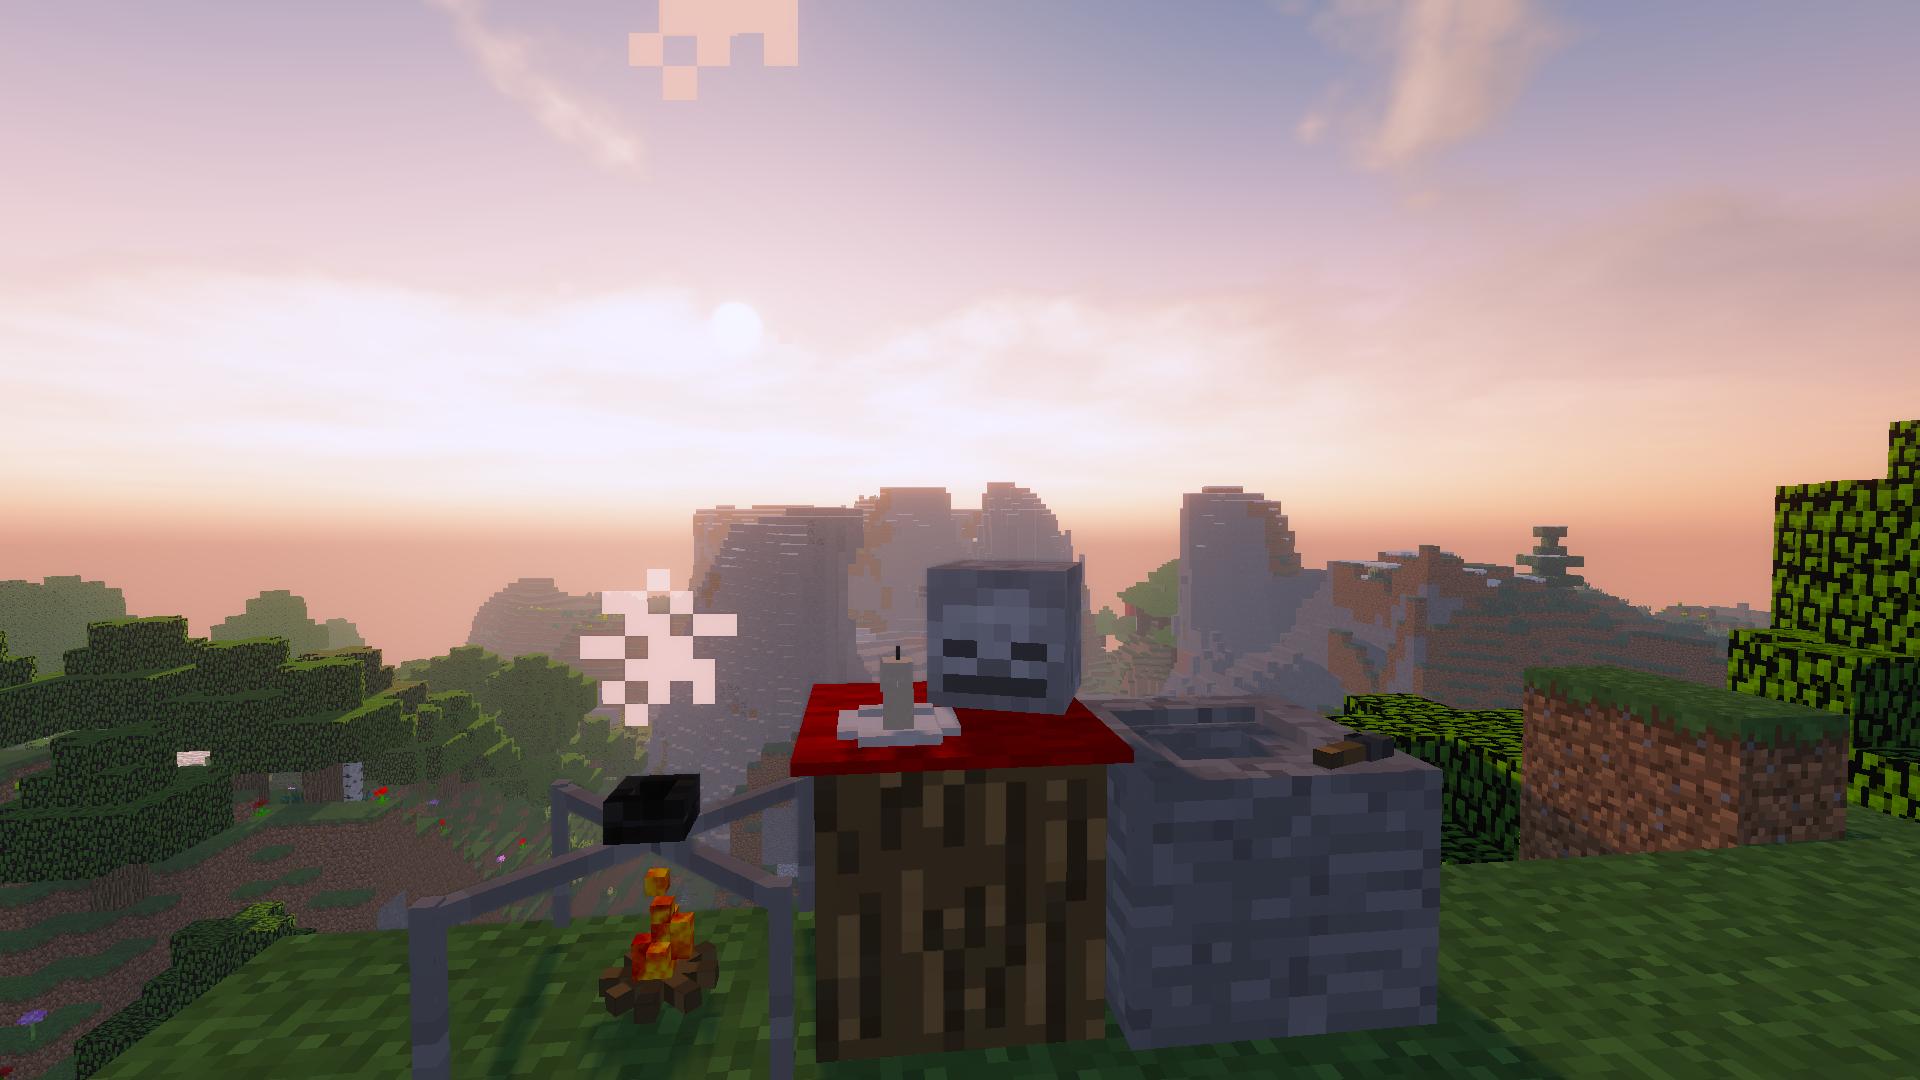 Th recipe blocks of the mod.